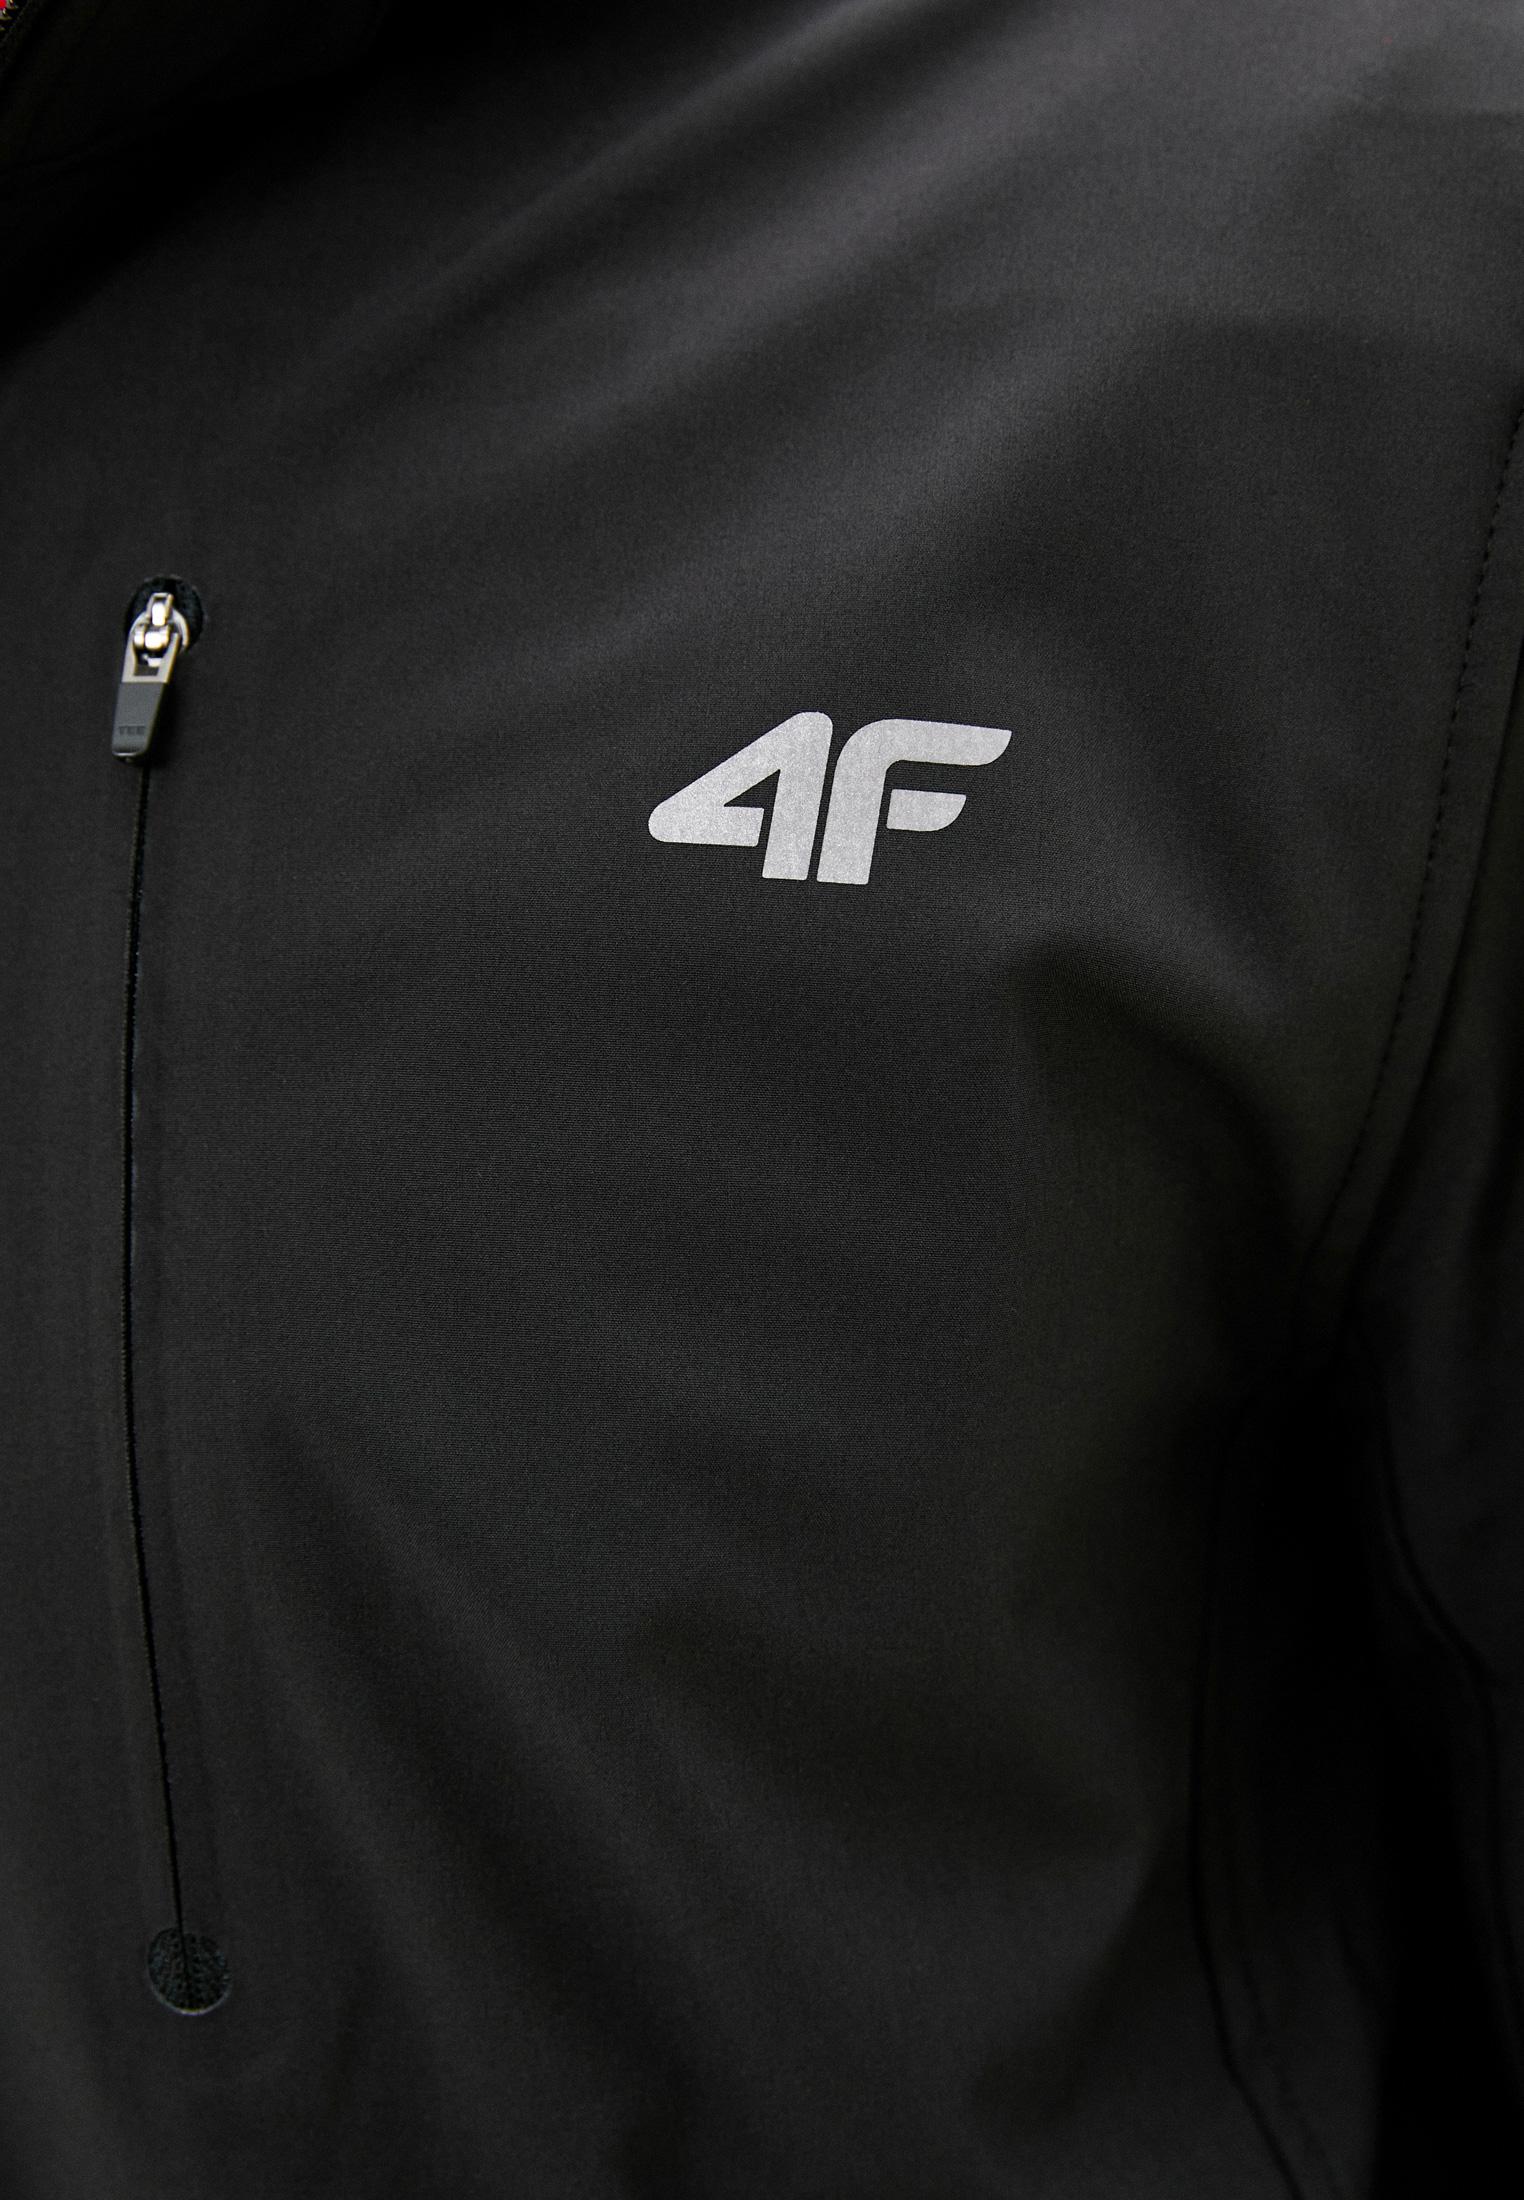 4F H4Z20-SFM003: изображение 5